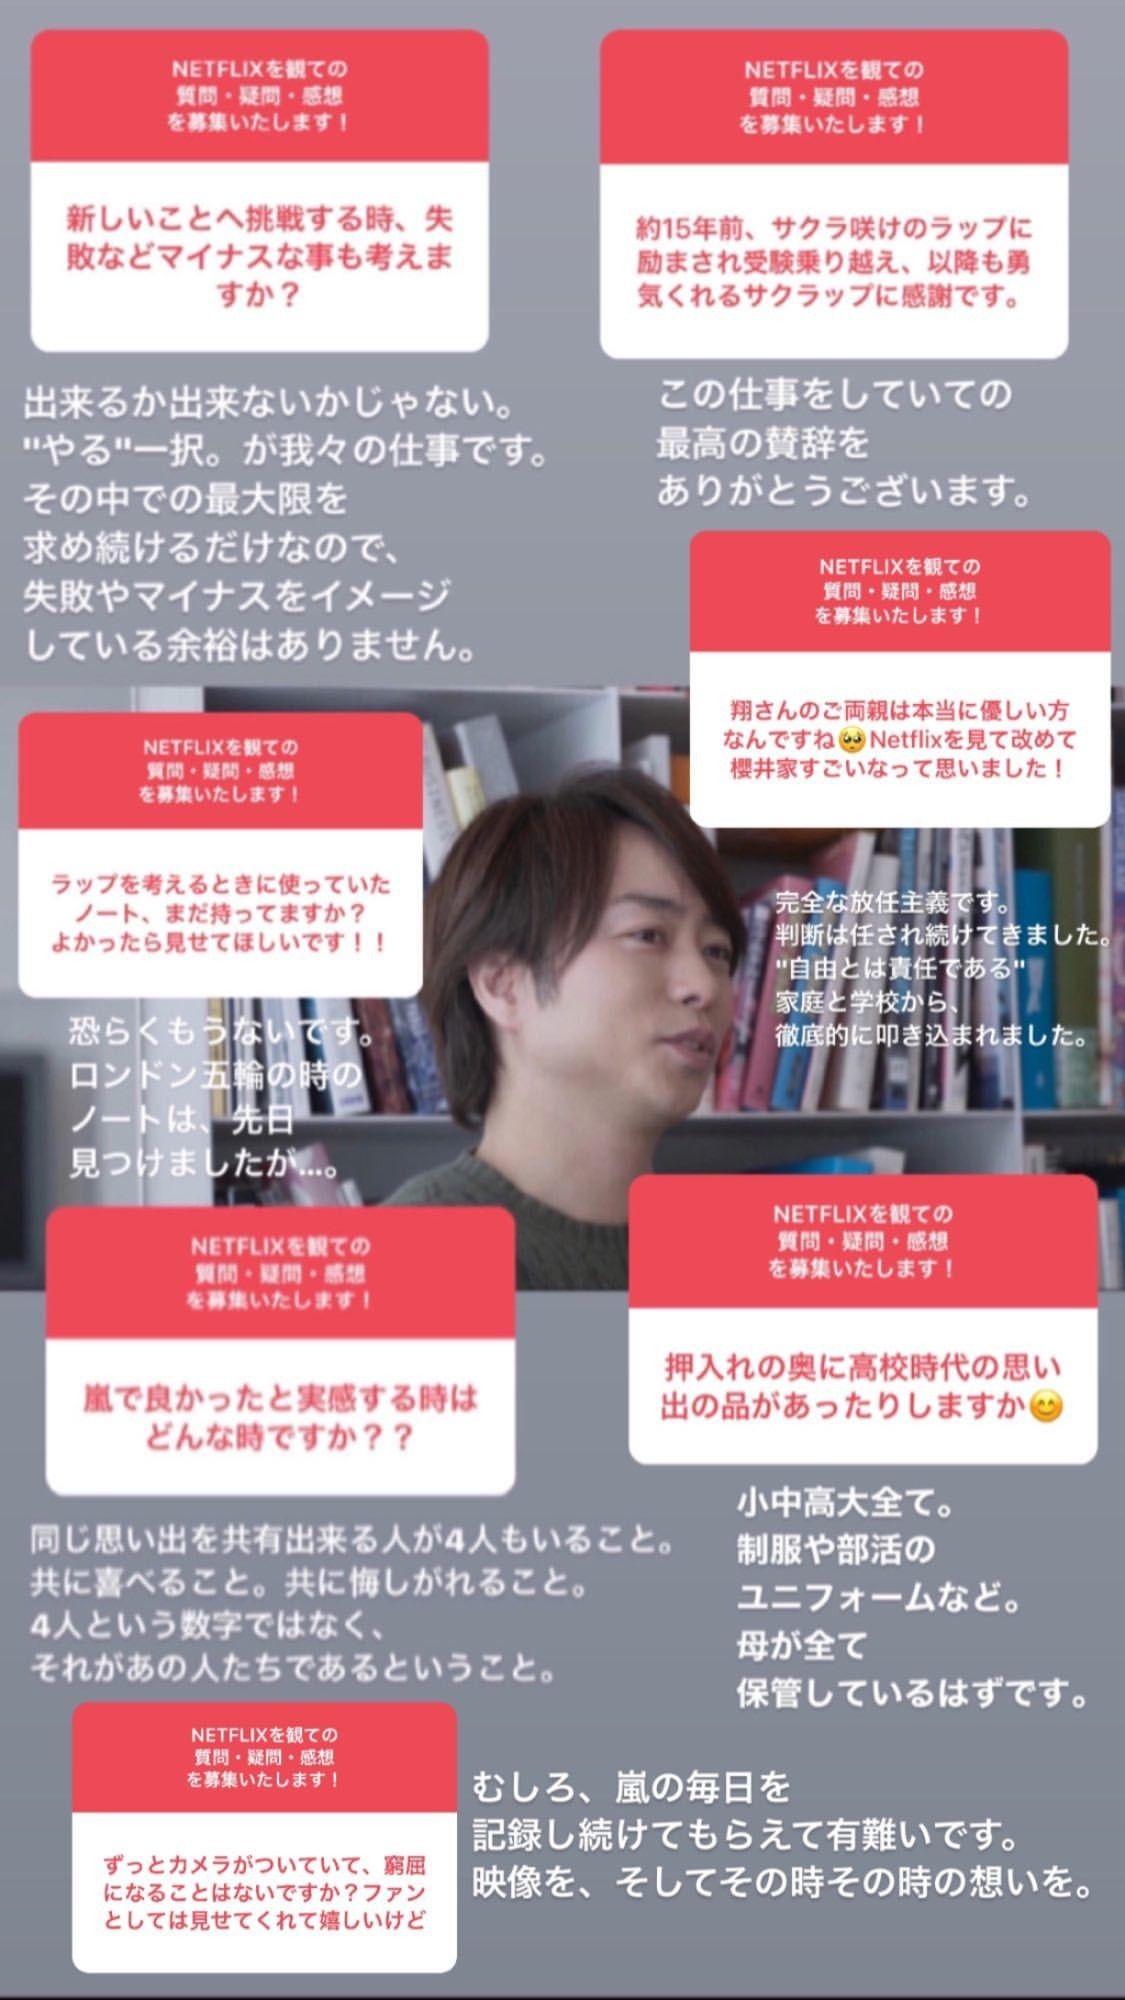 2020 0613 instagramストーリー 嵐 instagram love 嵐 櫻井翔